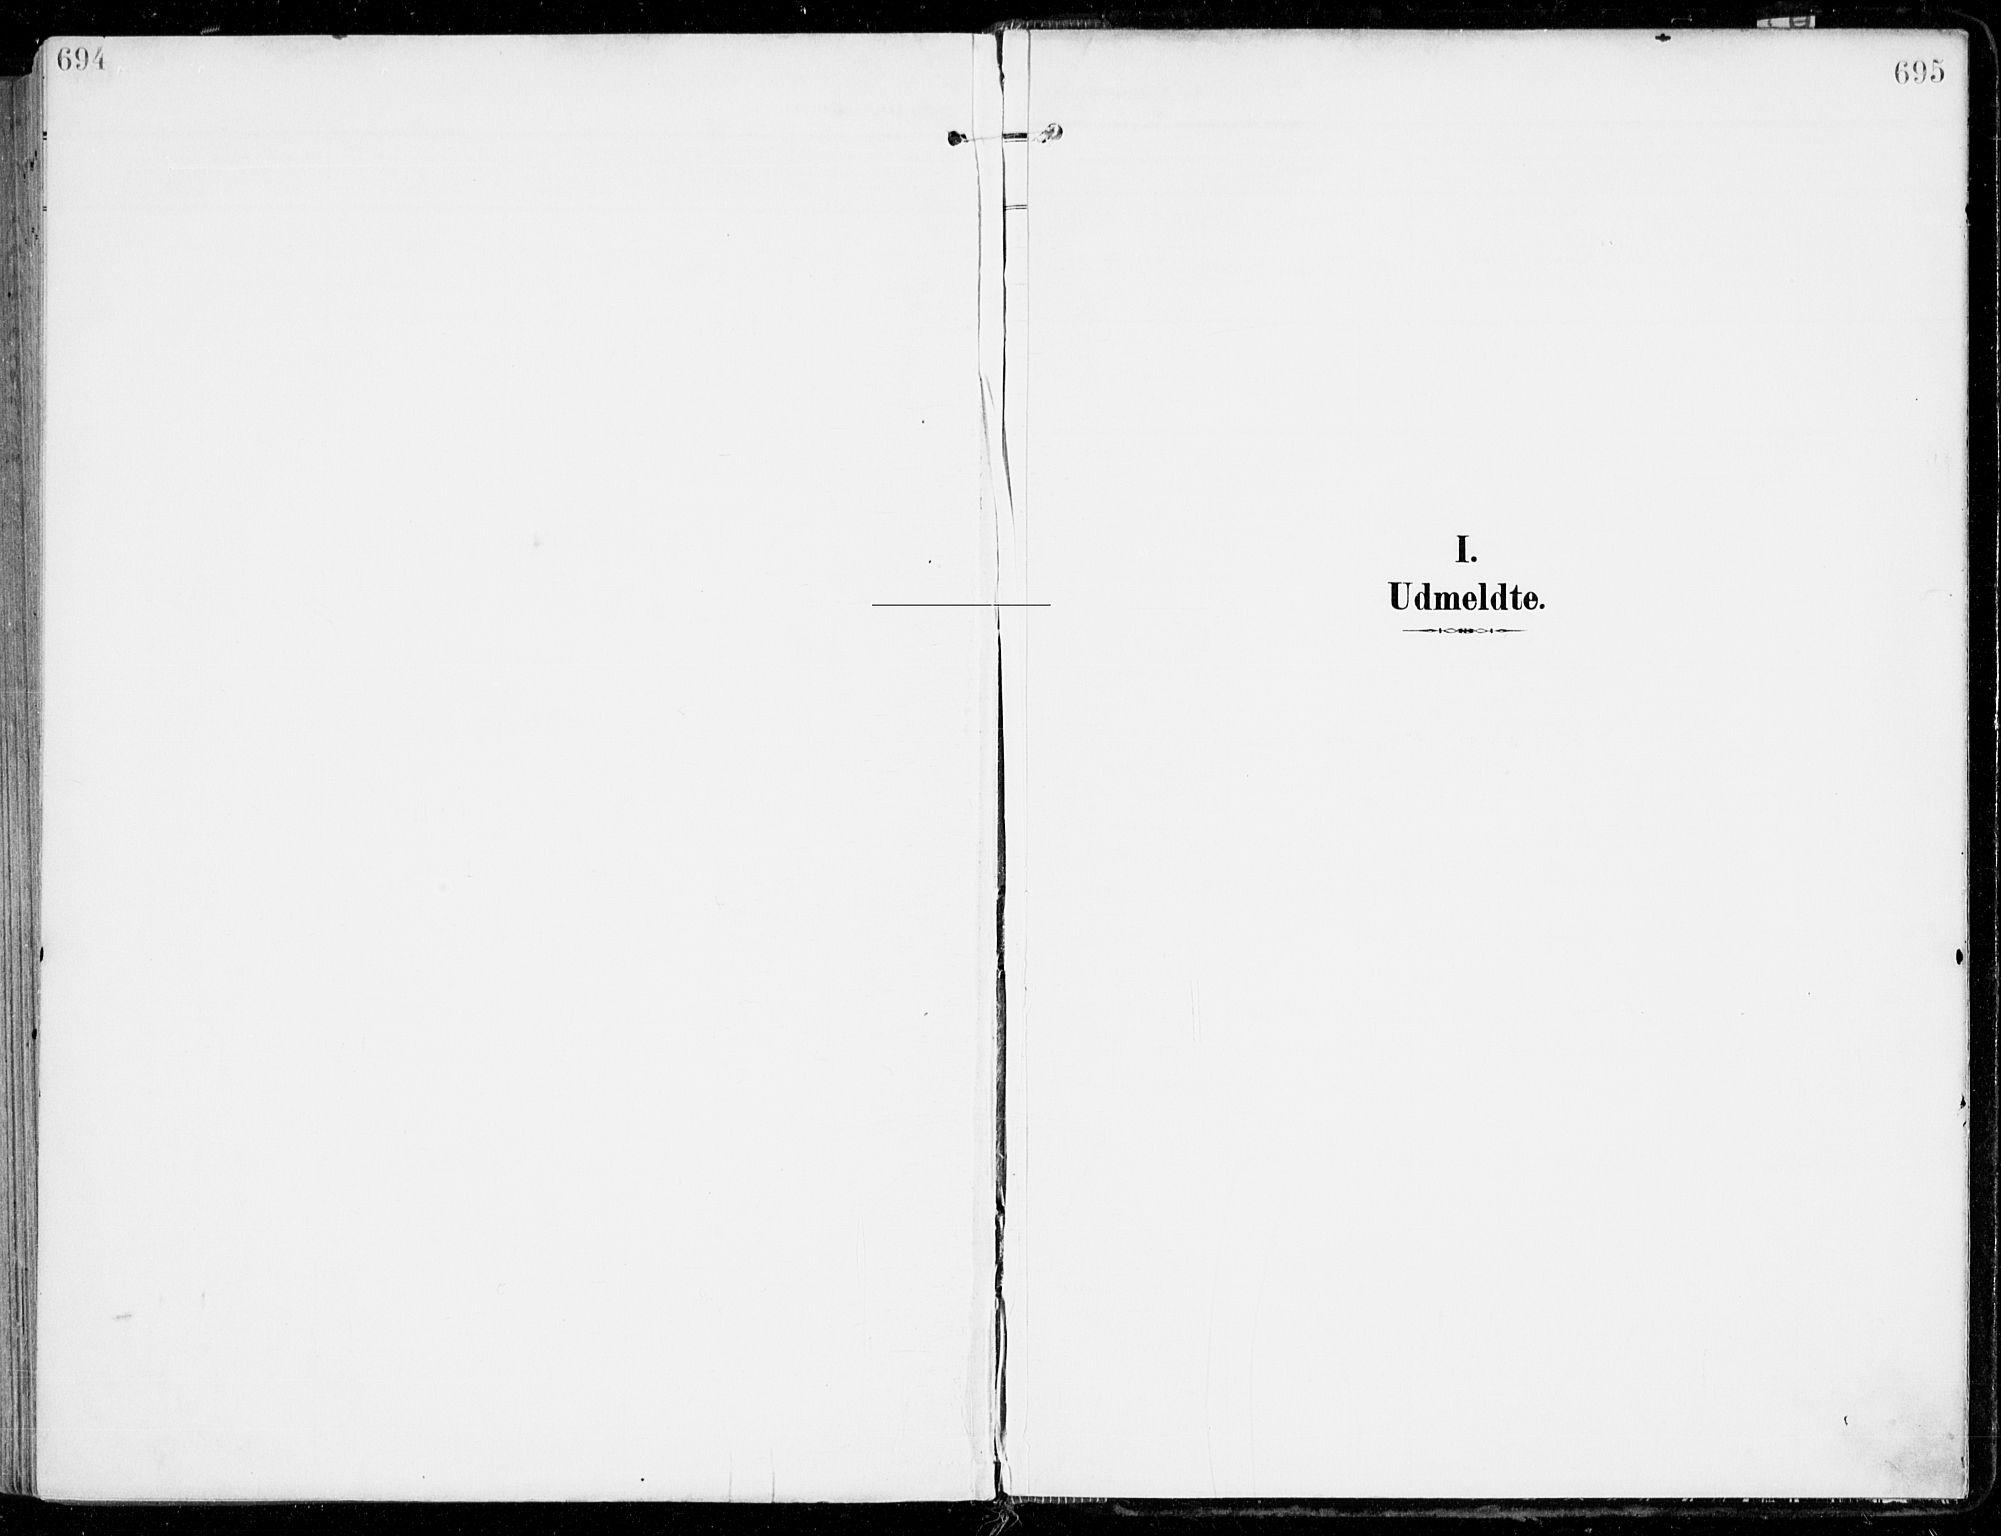 SAKO, Sem kirkebøker, F/Fb/L0006: Ministerialbok nr. II 6, 1905-1918, s. 694-695